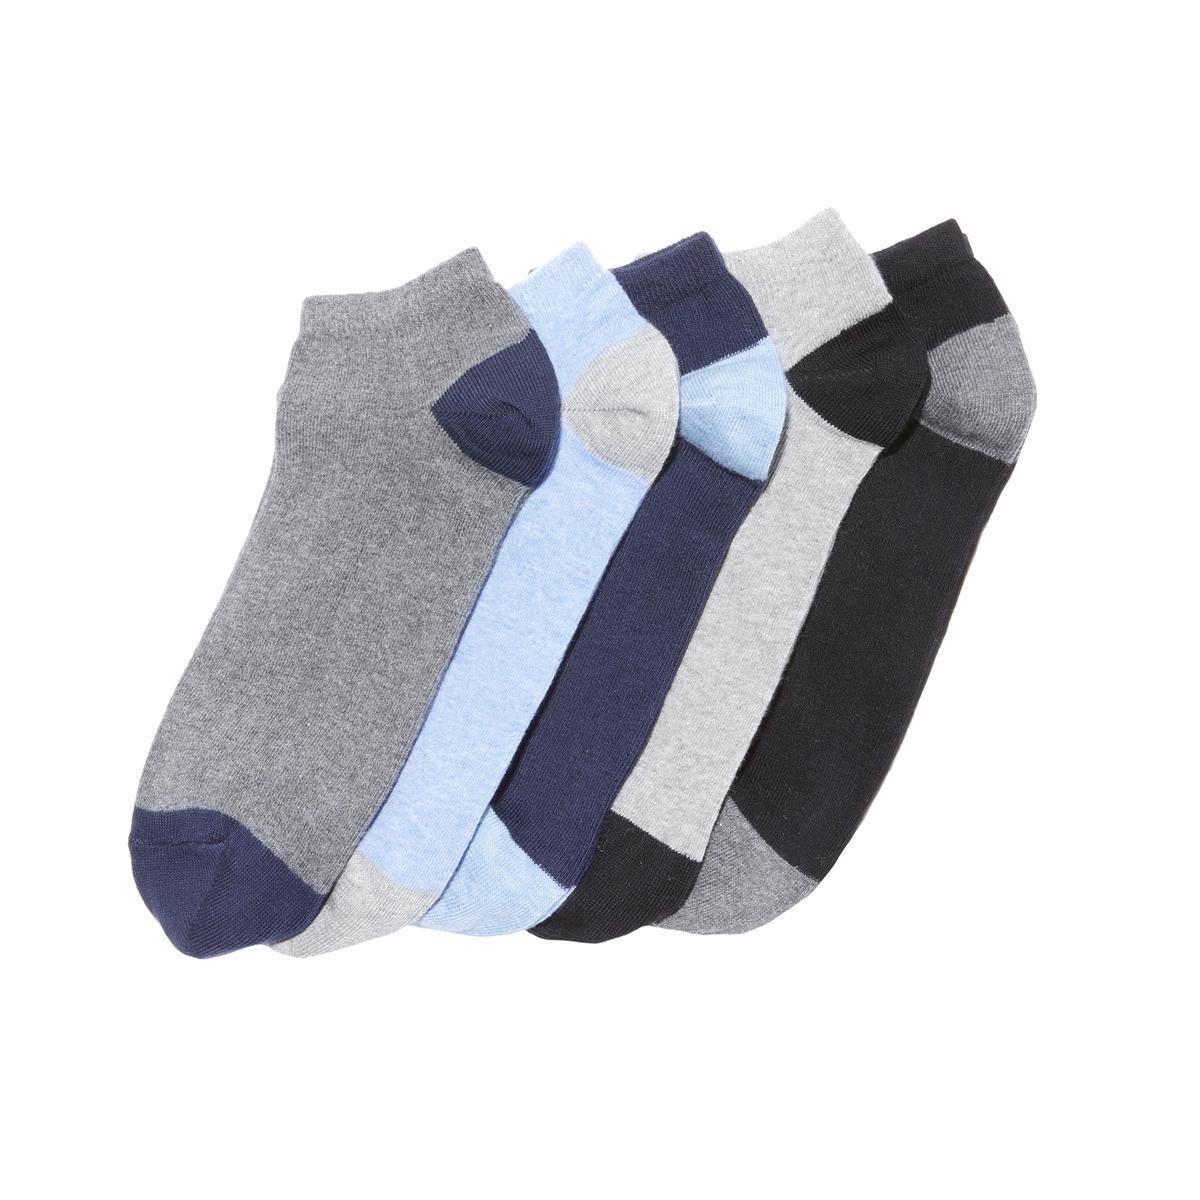 Комплект из 5 пар коротких носков комплект из 5 пар коротких носков из хлопка